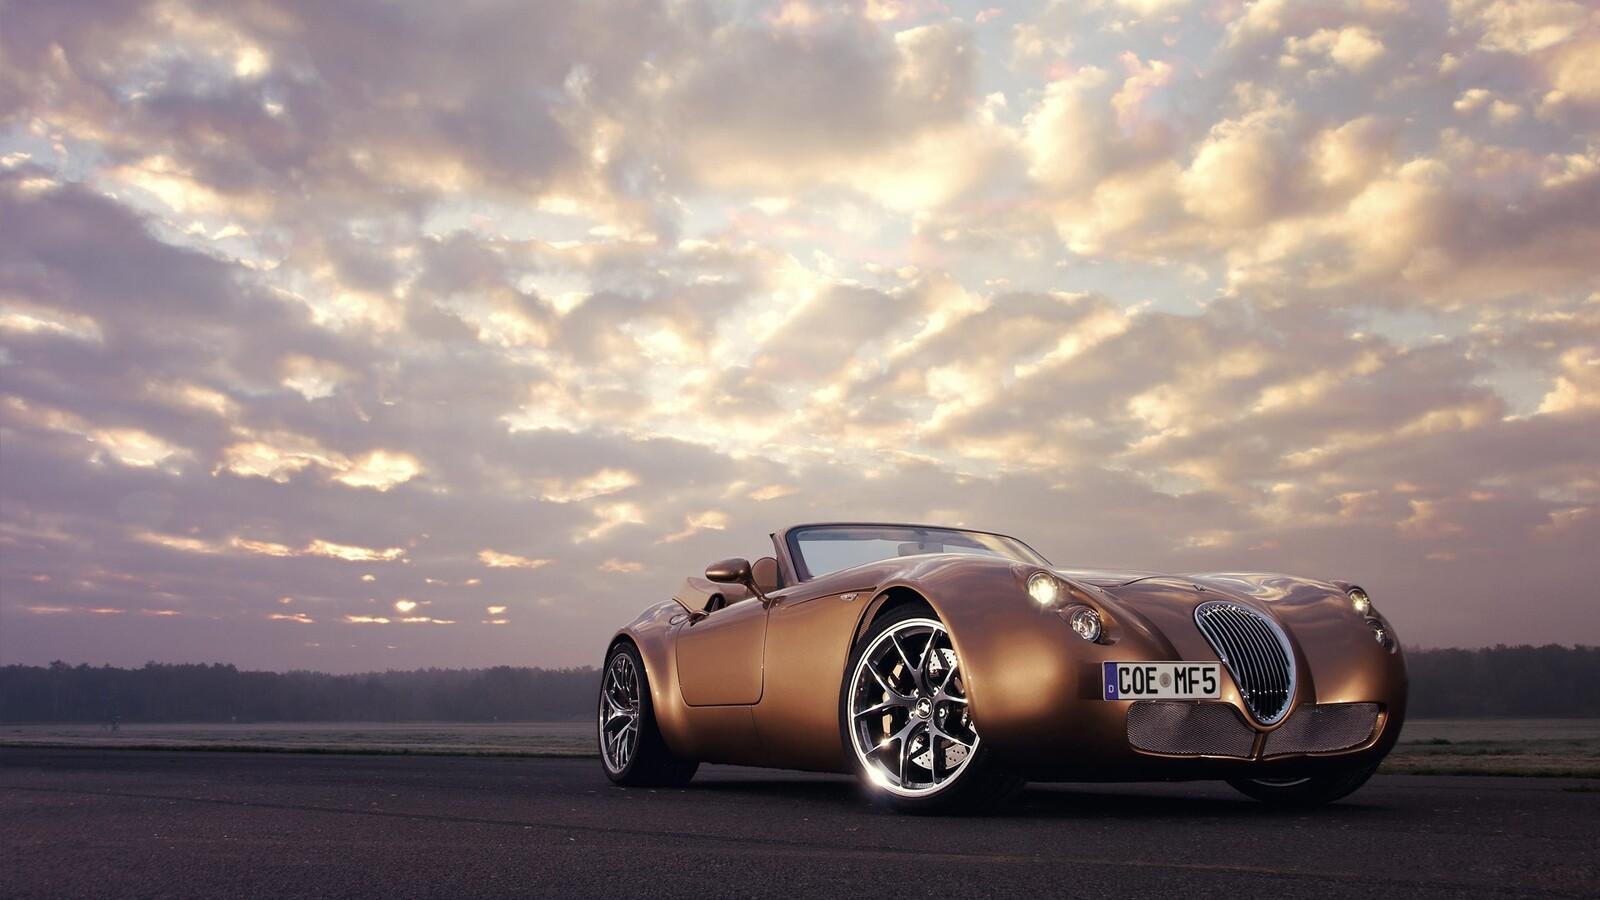 1600x900 Golden Vintage Car 1600x900 Resolution Hd 4k